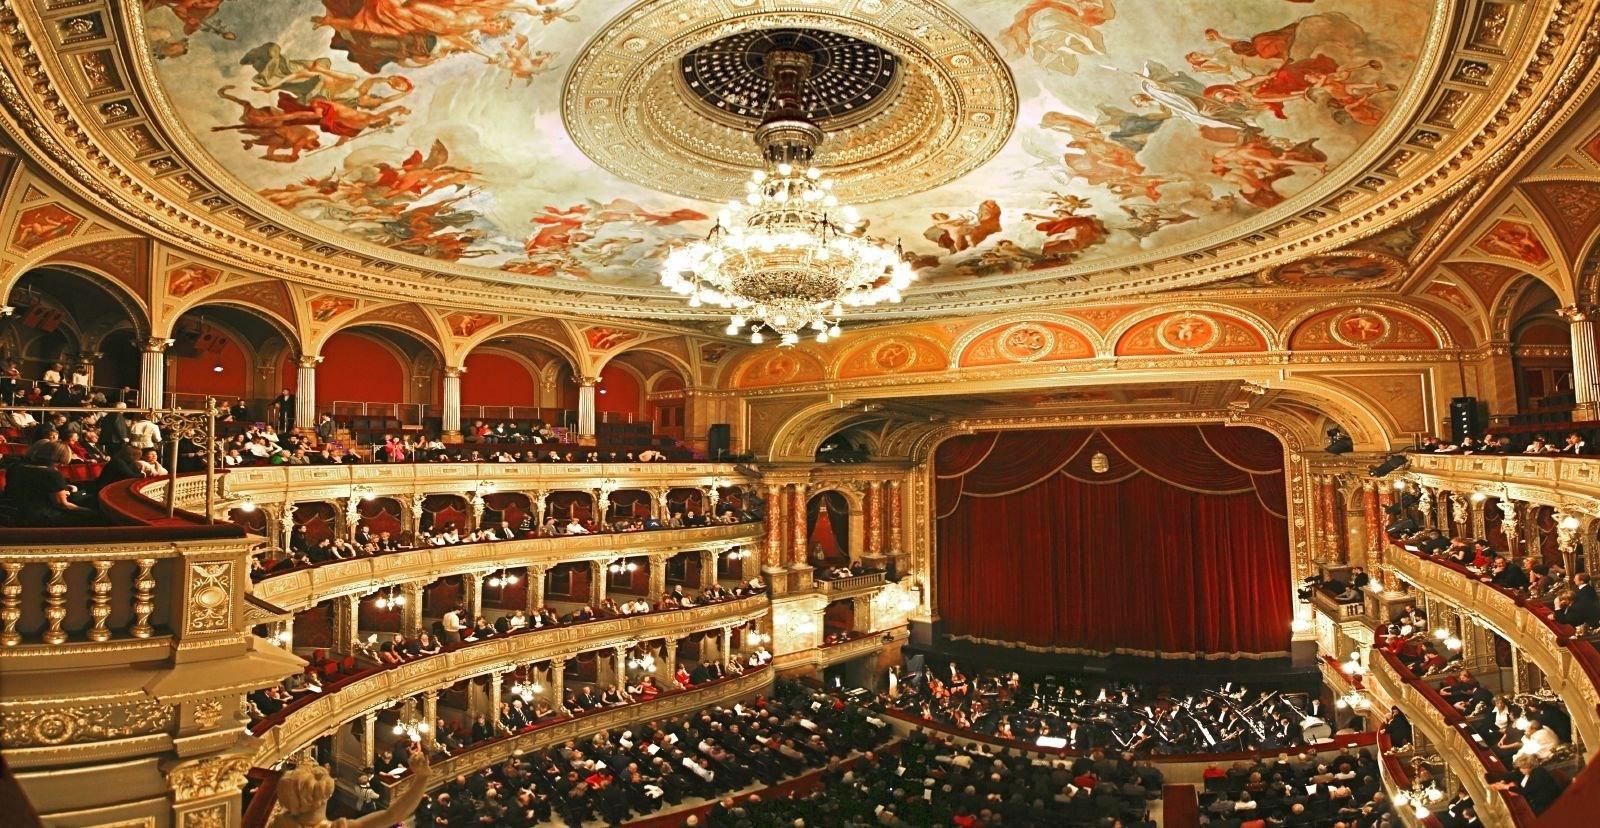 HQ Opera Wallpapers | File 454.55Kb